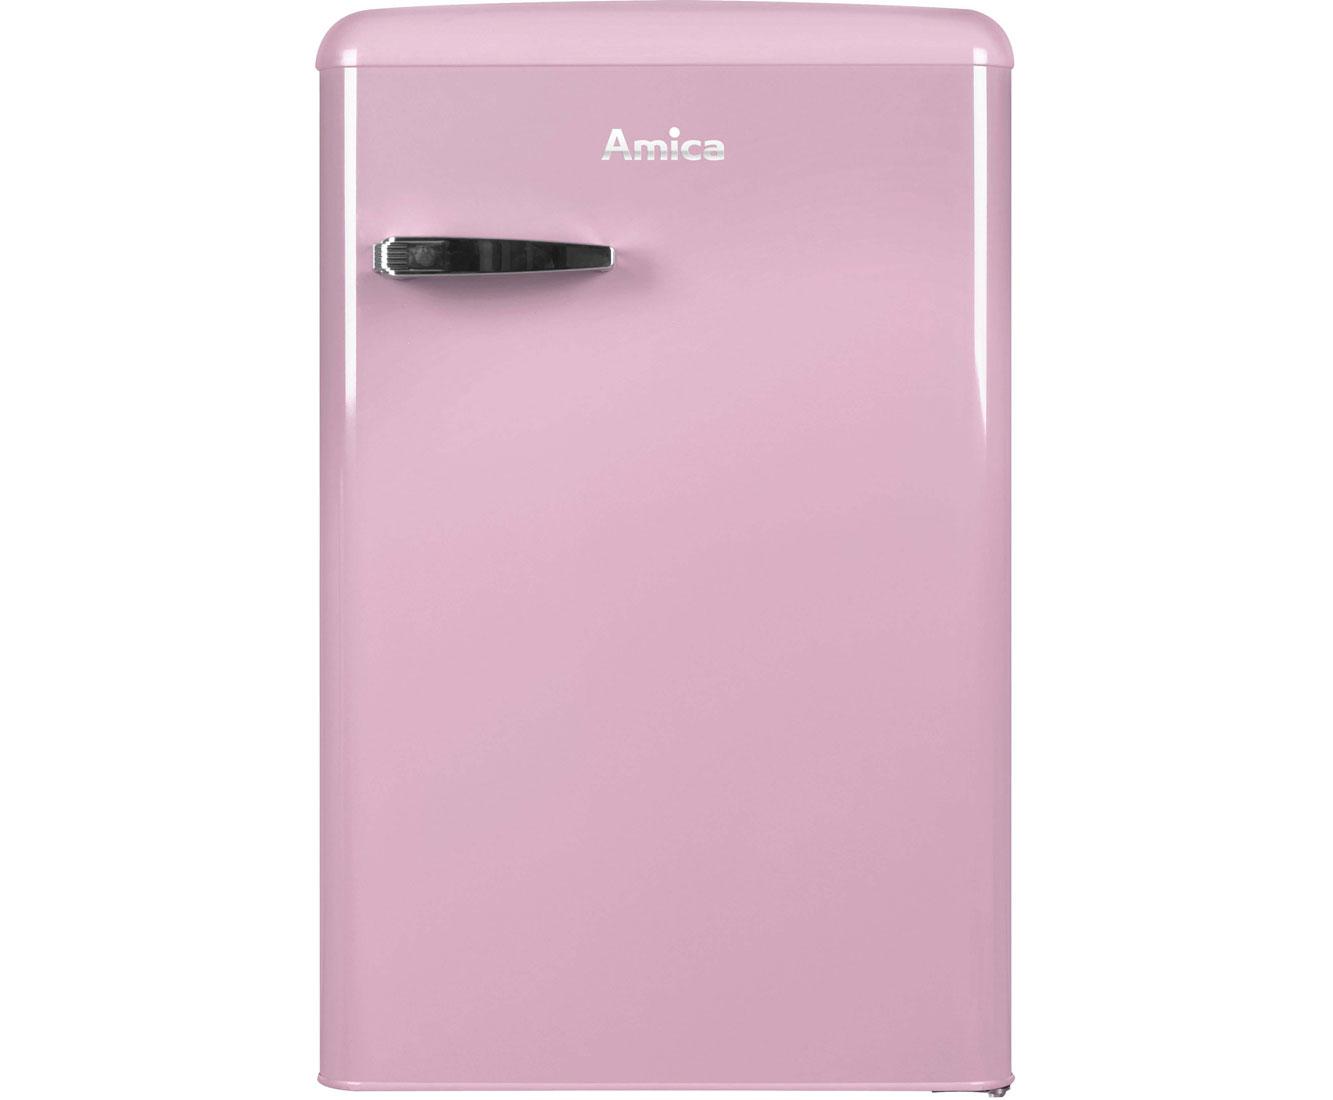 Smeg Kühlschrank Pink : Pinker kühlschrank smeg fab rb stand kühlschrank weiß für